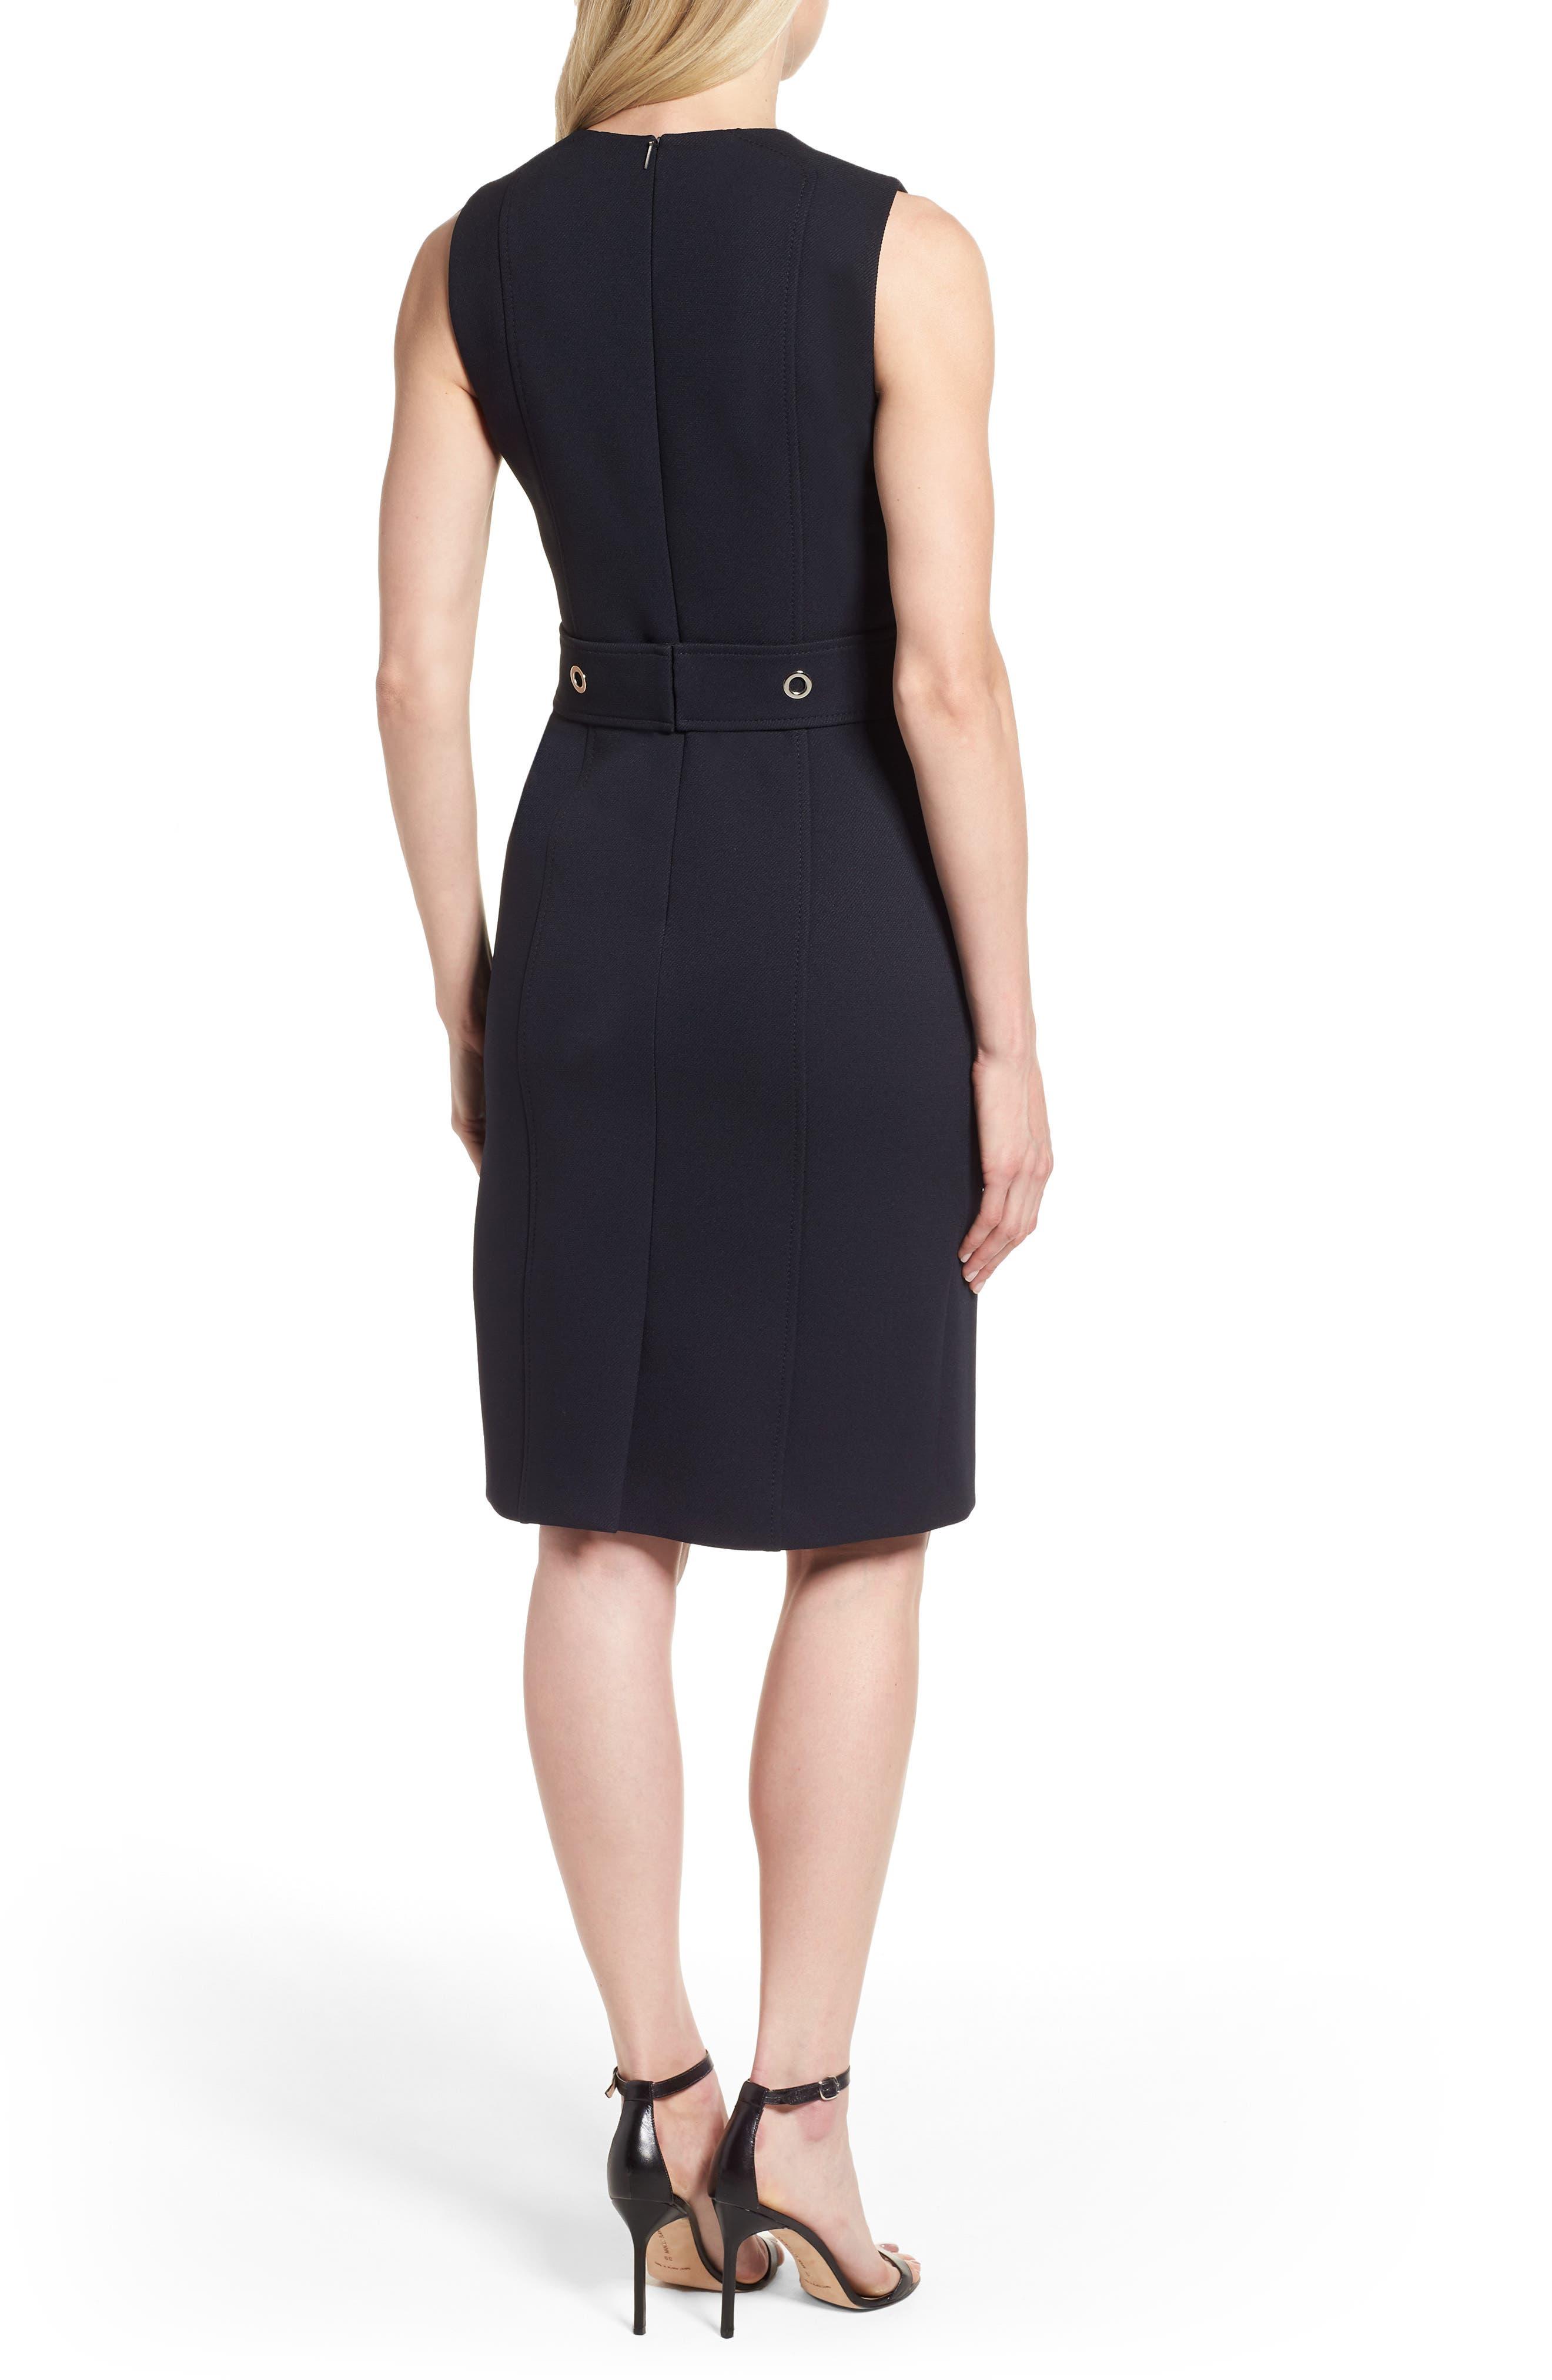 Duleama Belted Sheath Dress,                             Alternate thumbnail 2, color,                             Navy